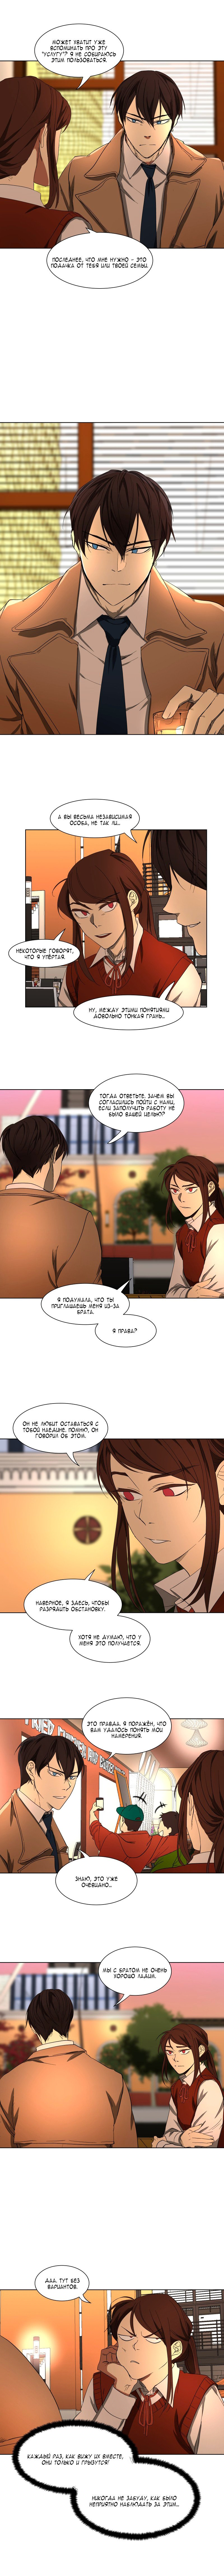 Манга Я люблю Ю / I love Yoo  - Том 1 Глава 26 Страница 6